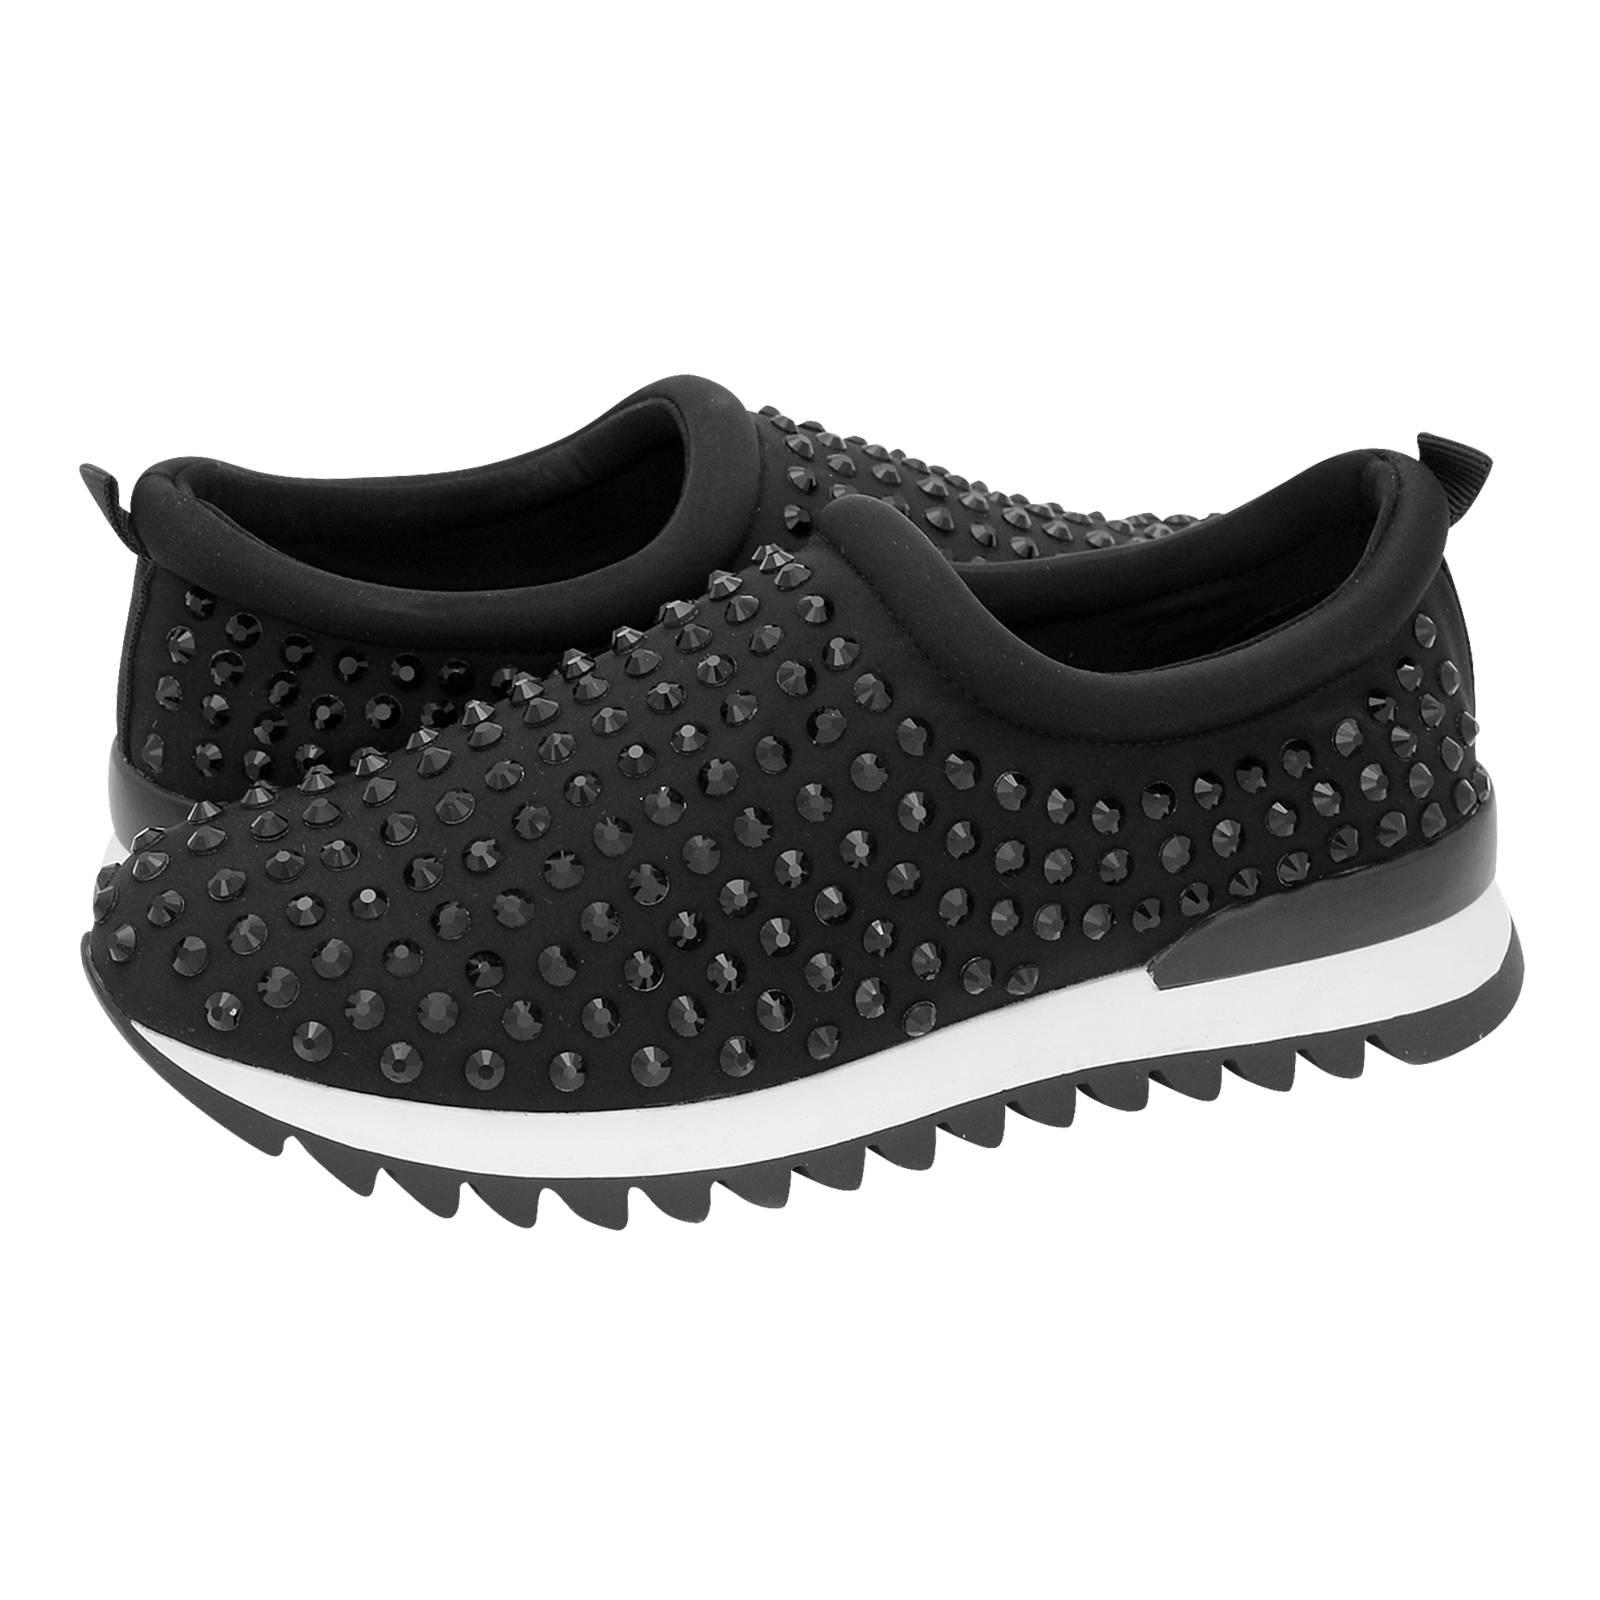 Cotillo - Γυναικεία παπούτσια casual Primadonna από λικρα - Gianna ... 004587d4219